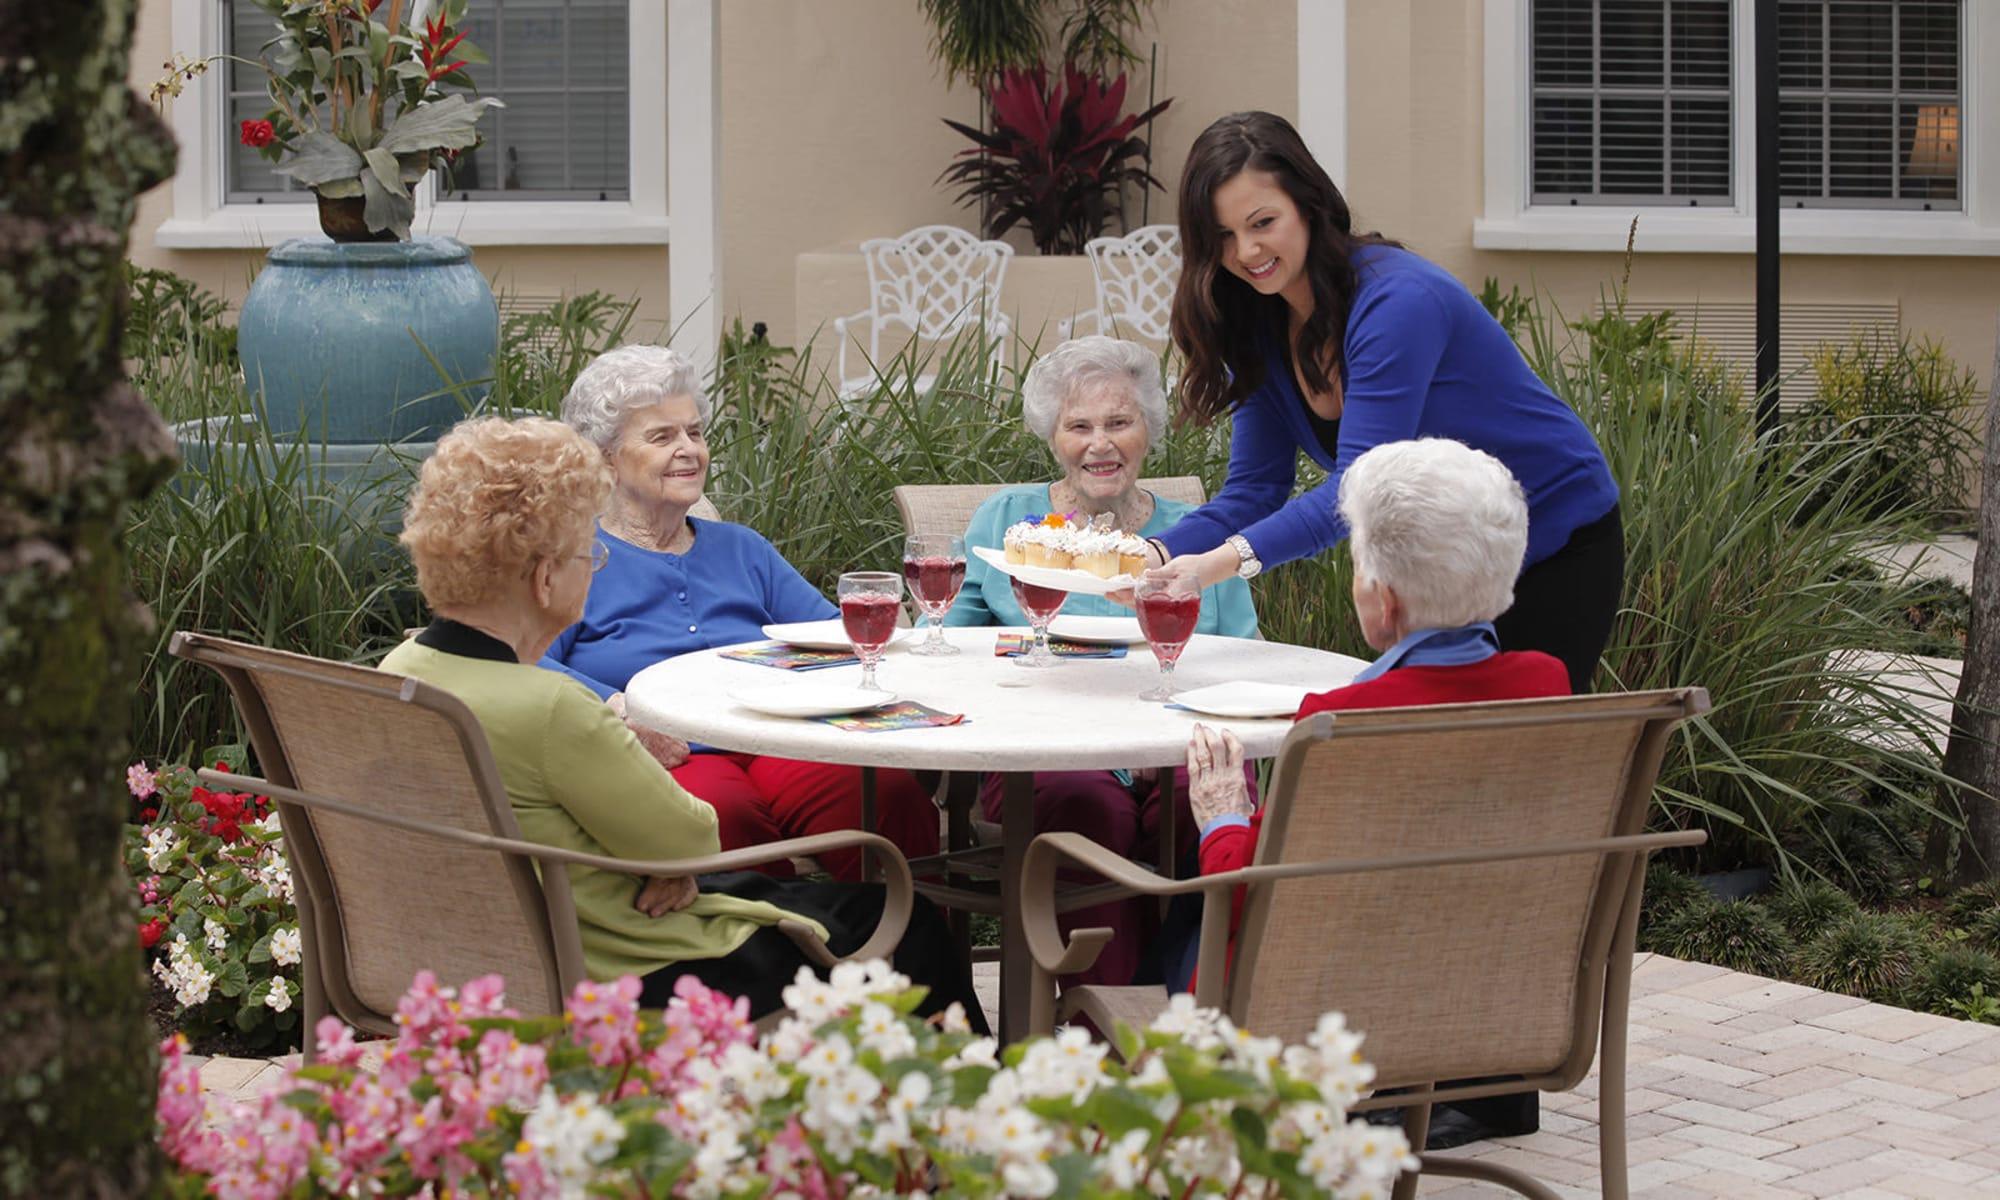 Senior living at Tequesta Terrace in Tequesta, Florida